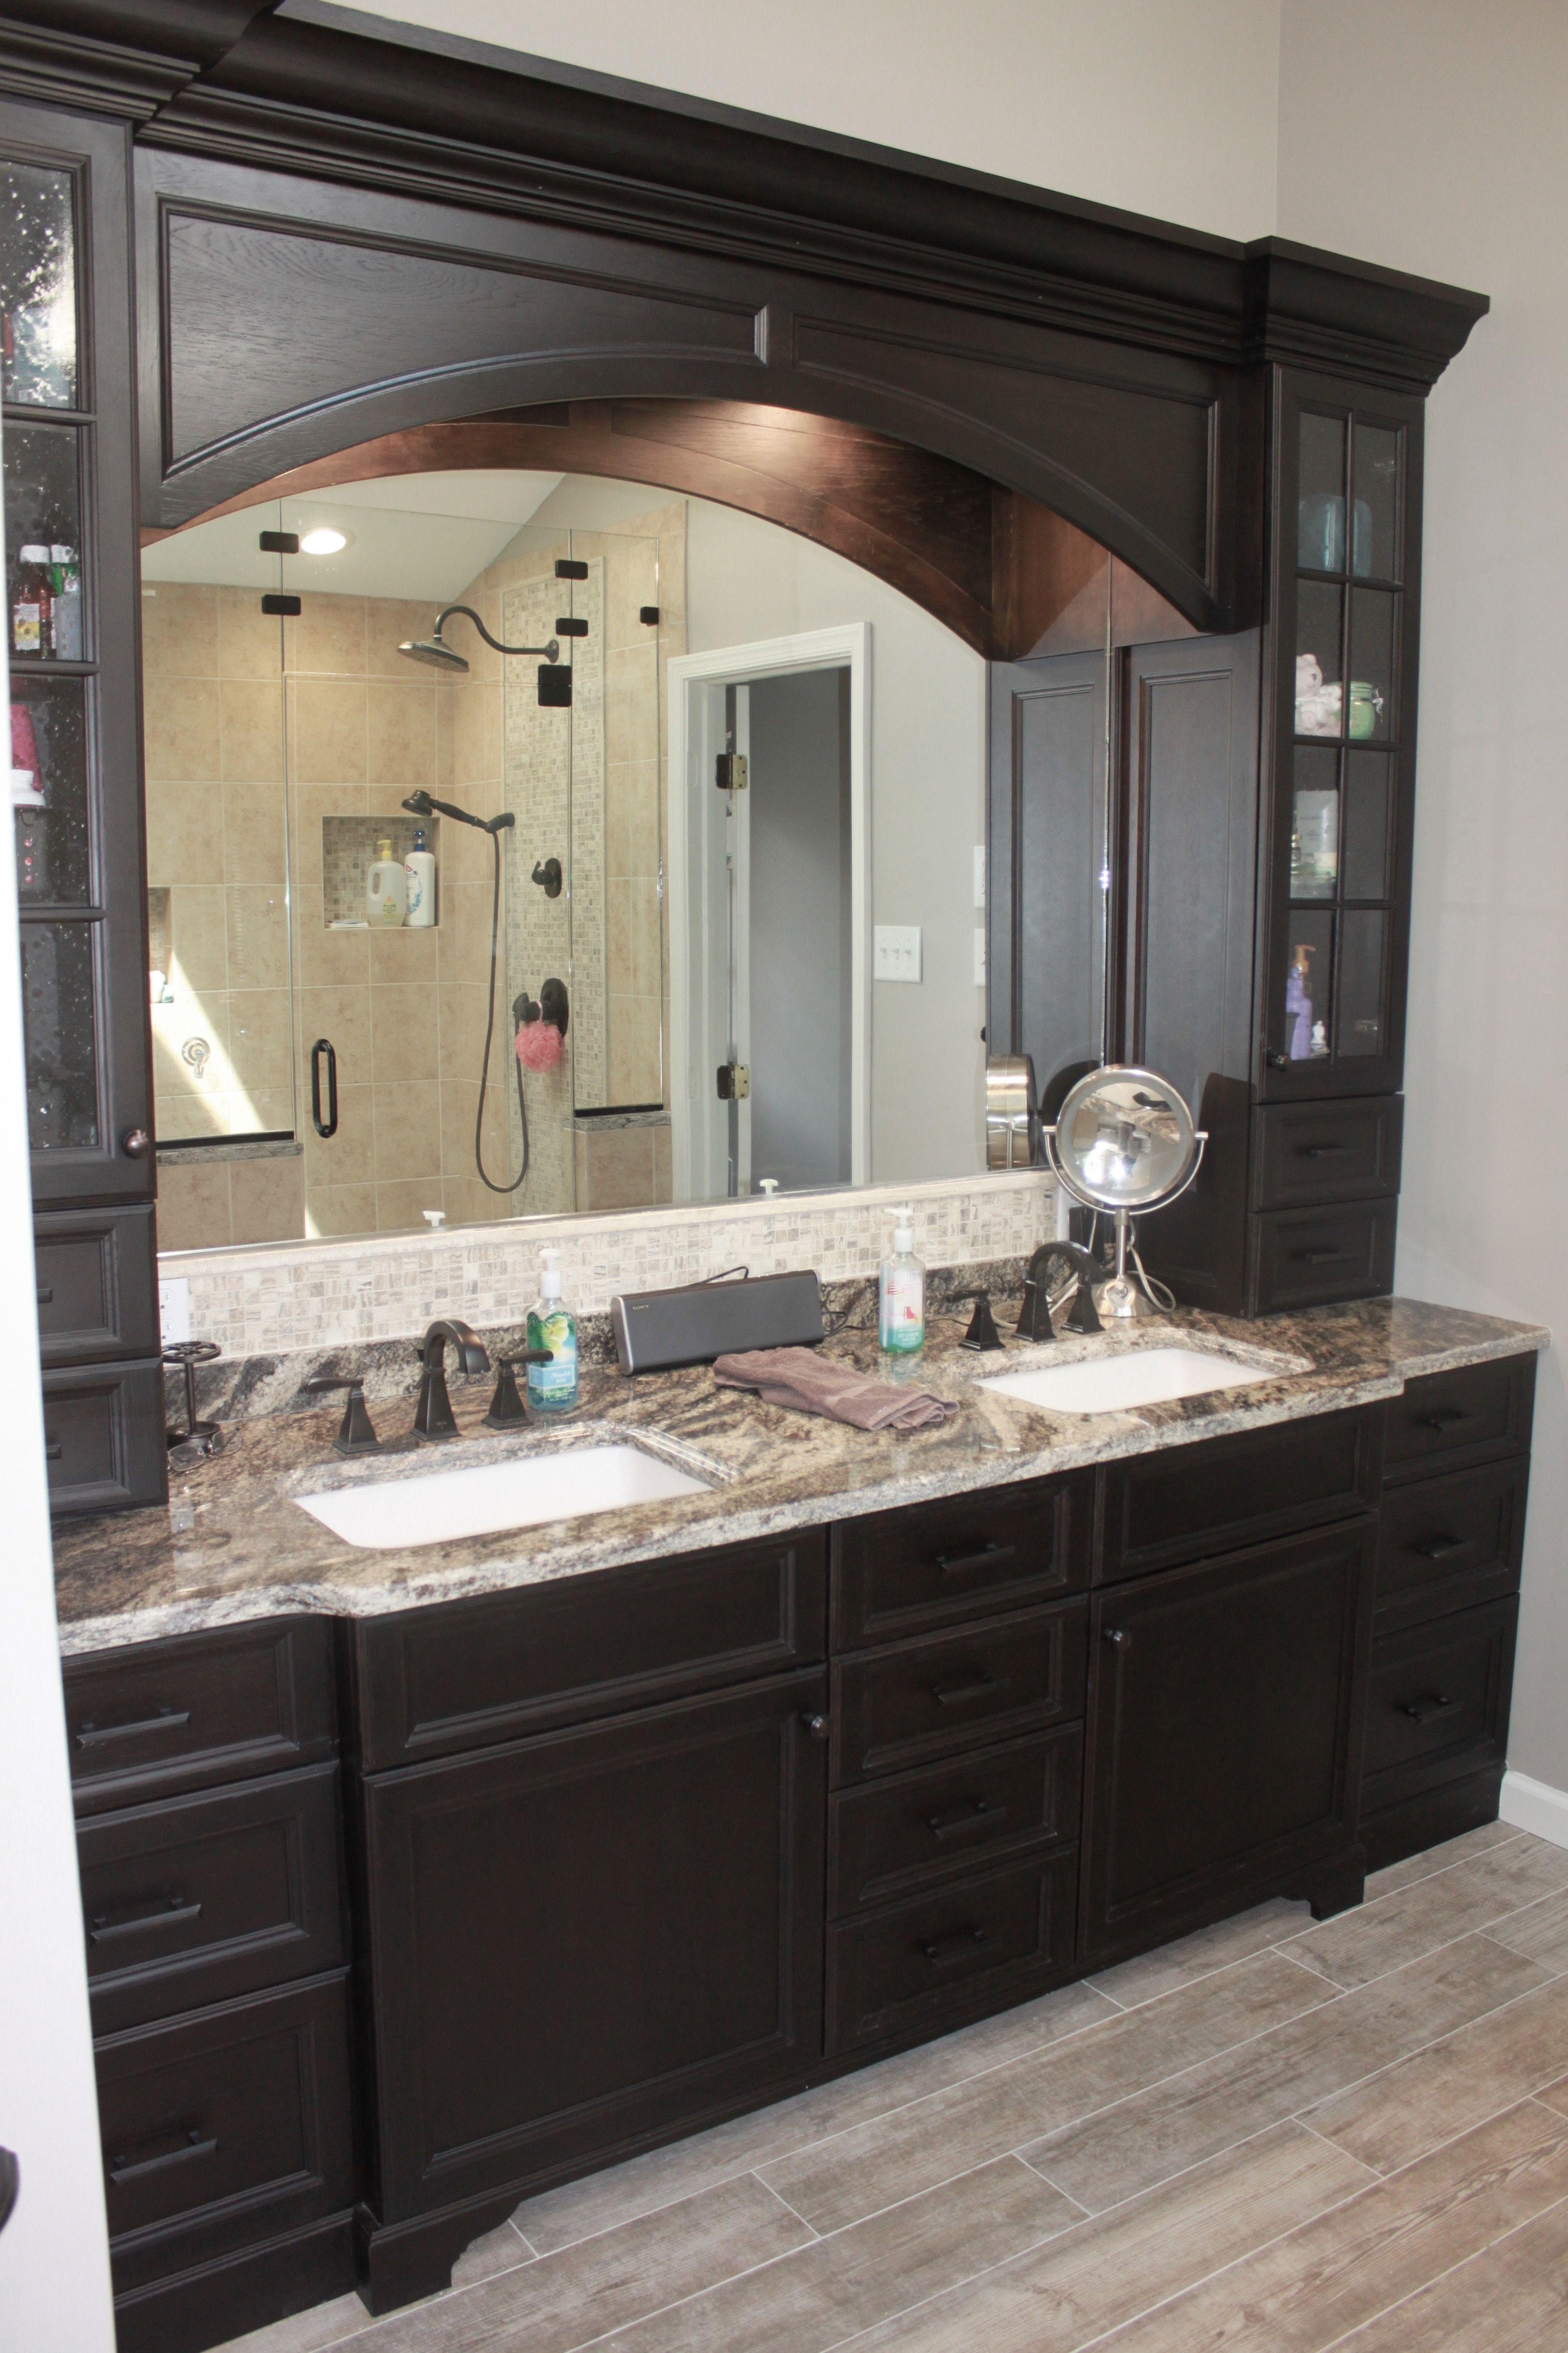 Custom Espresso Colored Double Vanity Cabinets Hockessin De Bathrooms Pinterest Double